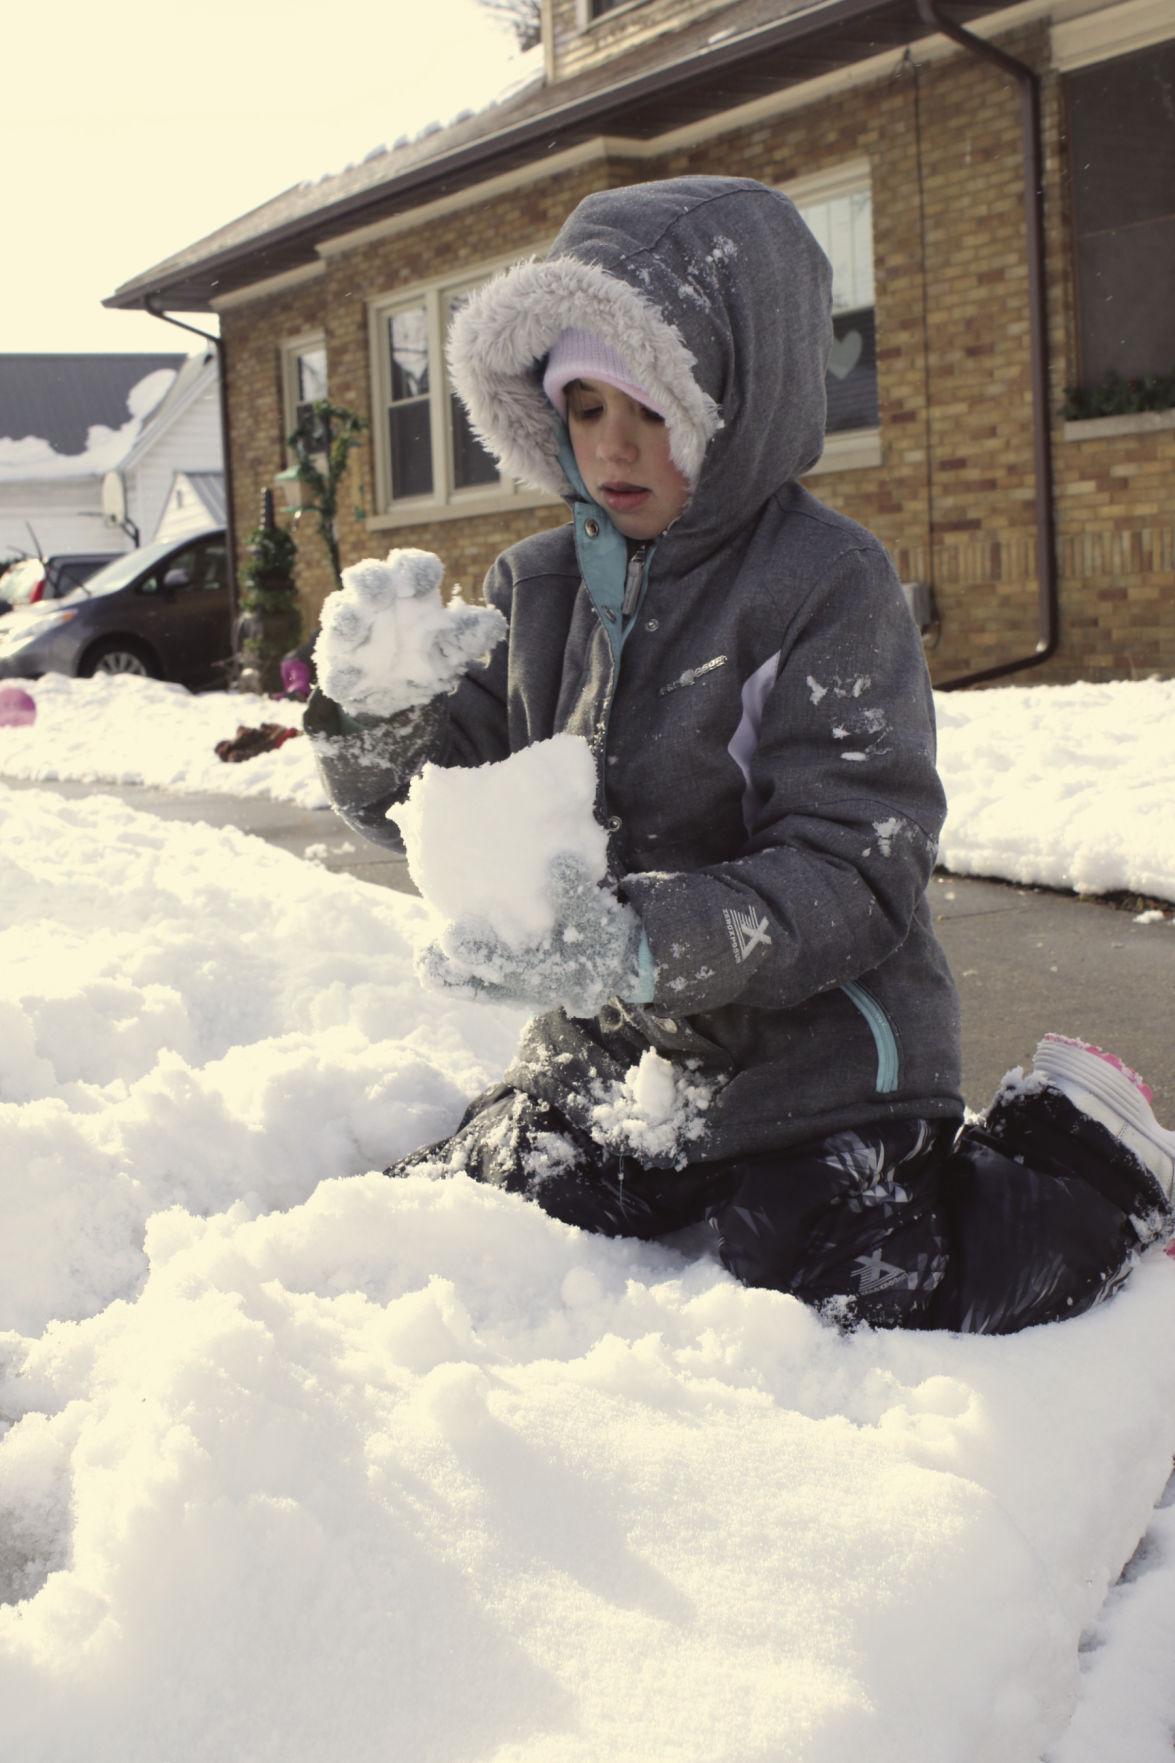 Sibling snow fun 1